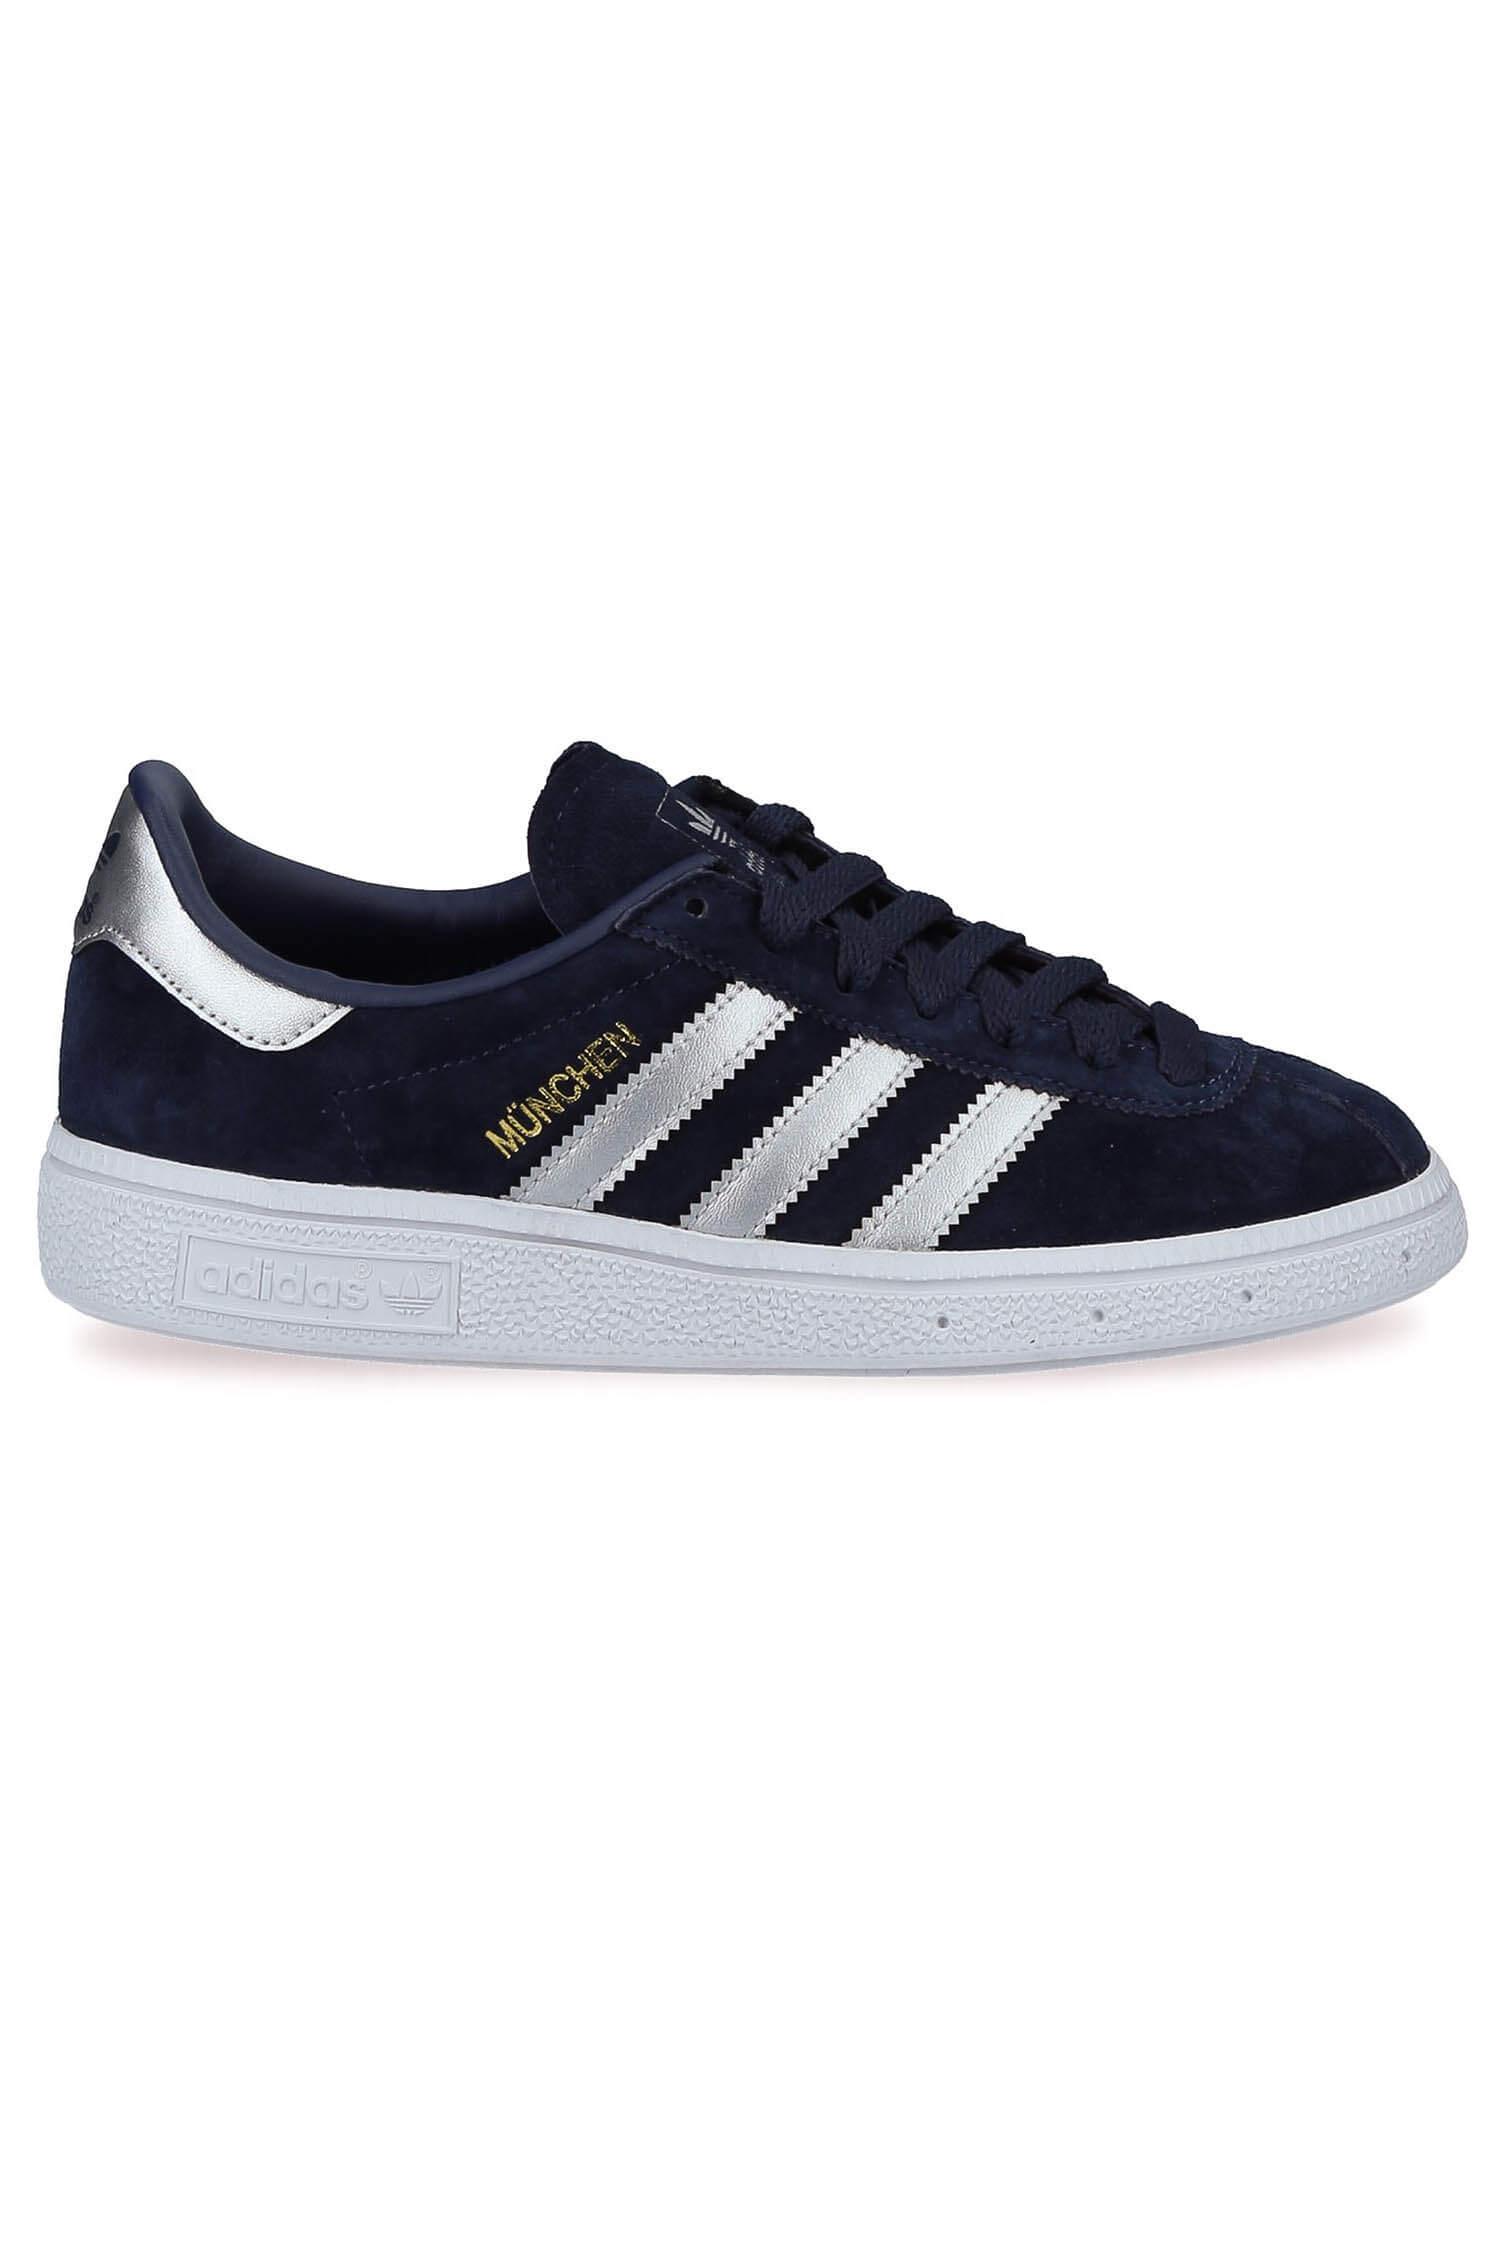 buy popular c4b26 4b82c Accueil · Chaussures de sport, baskets · adidas Originals  Baskets Munchen.  adidas Originals   Baskets Munchen ...